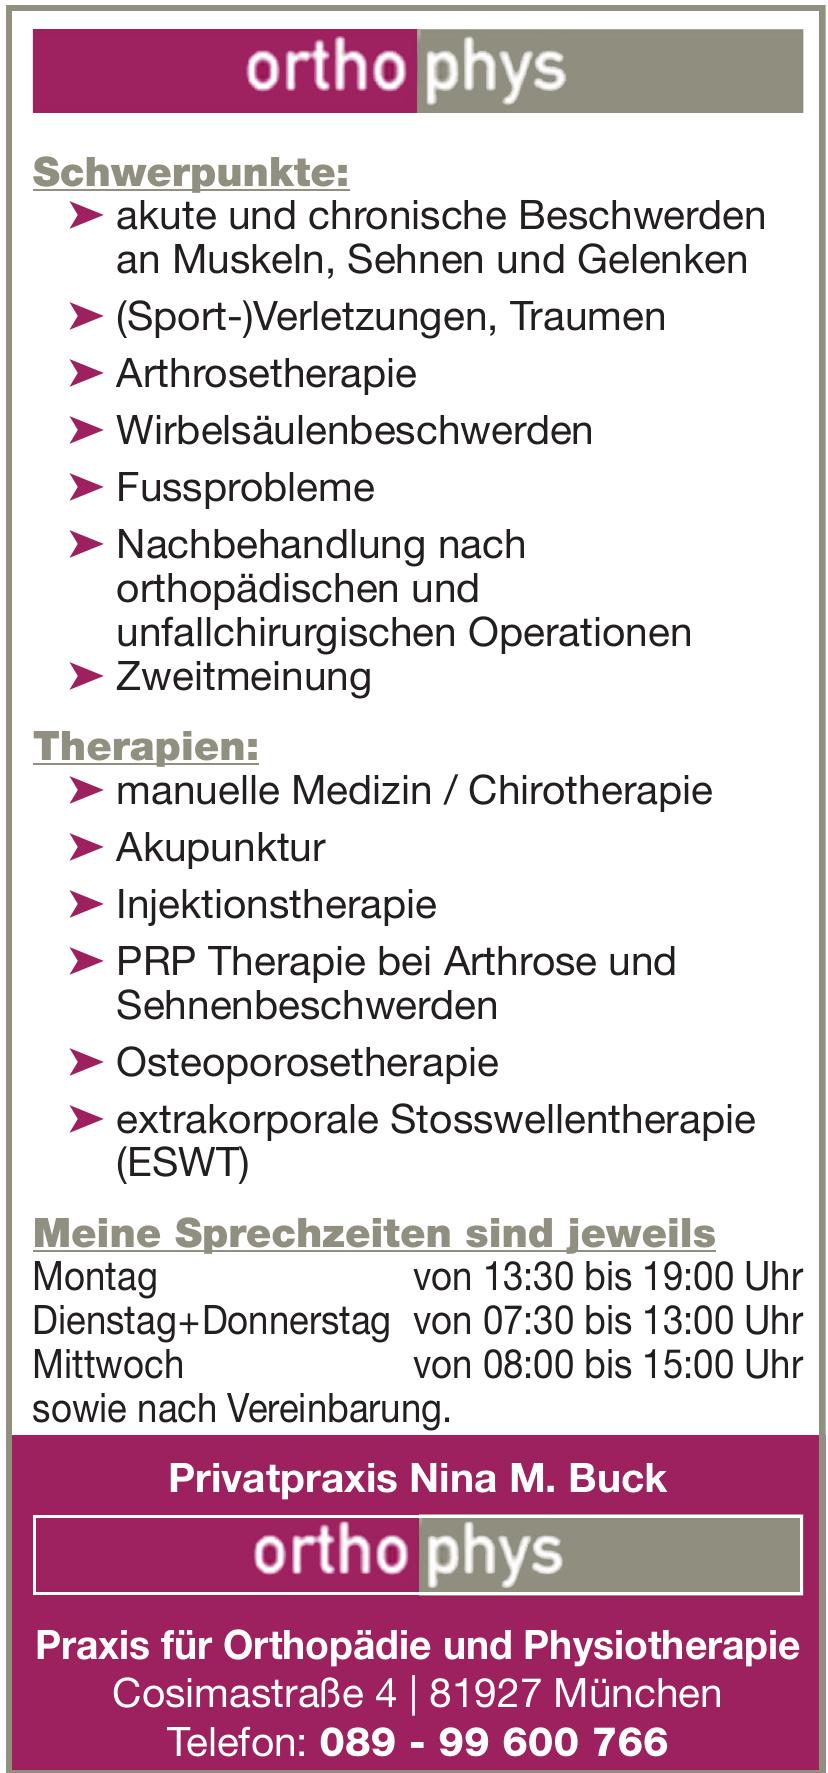 Privatpraxis Nina M. Buck ortho phys - Praxis für Orthopädie und Physiotherapie